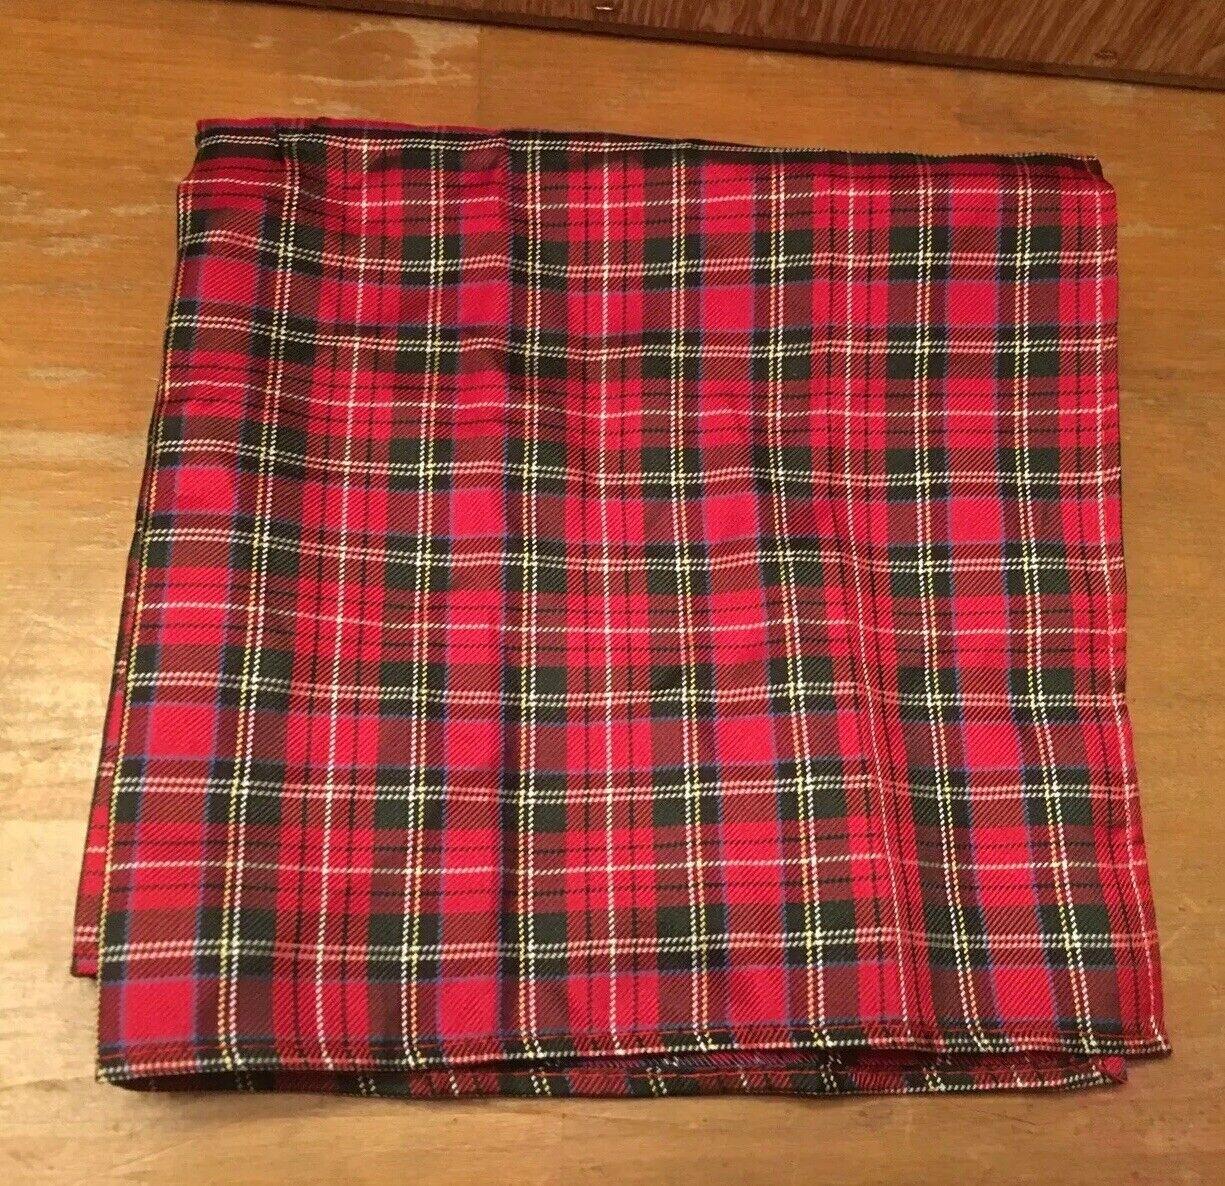 Tommy Hilfiger Silk Pocket Square NWOT Tartan Plaid 100% Silk TOMMY